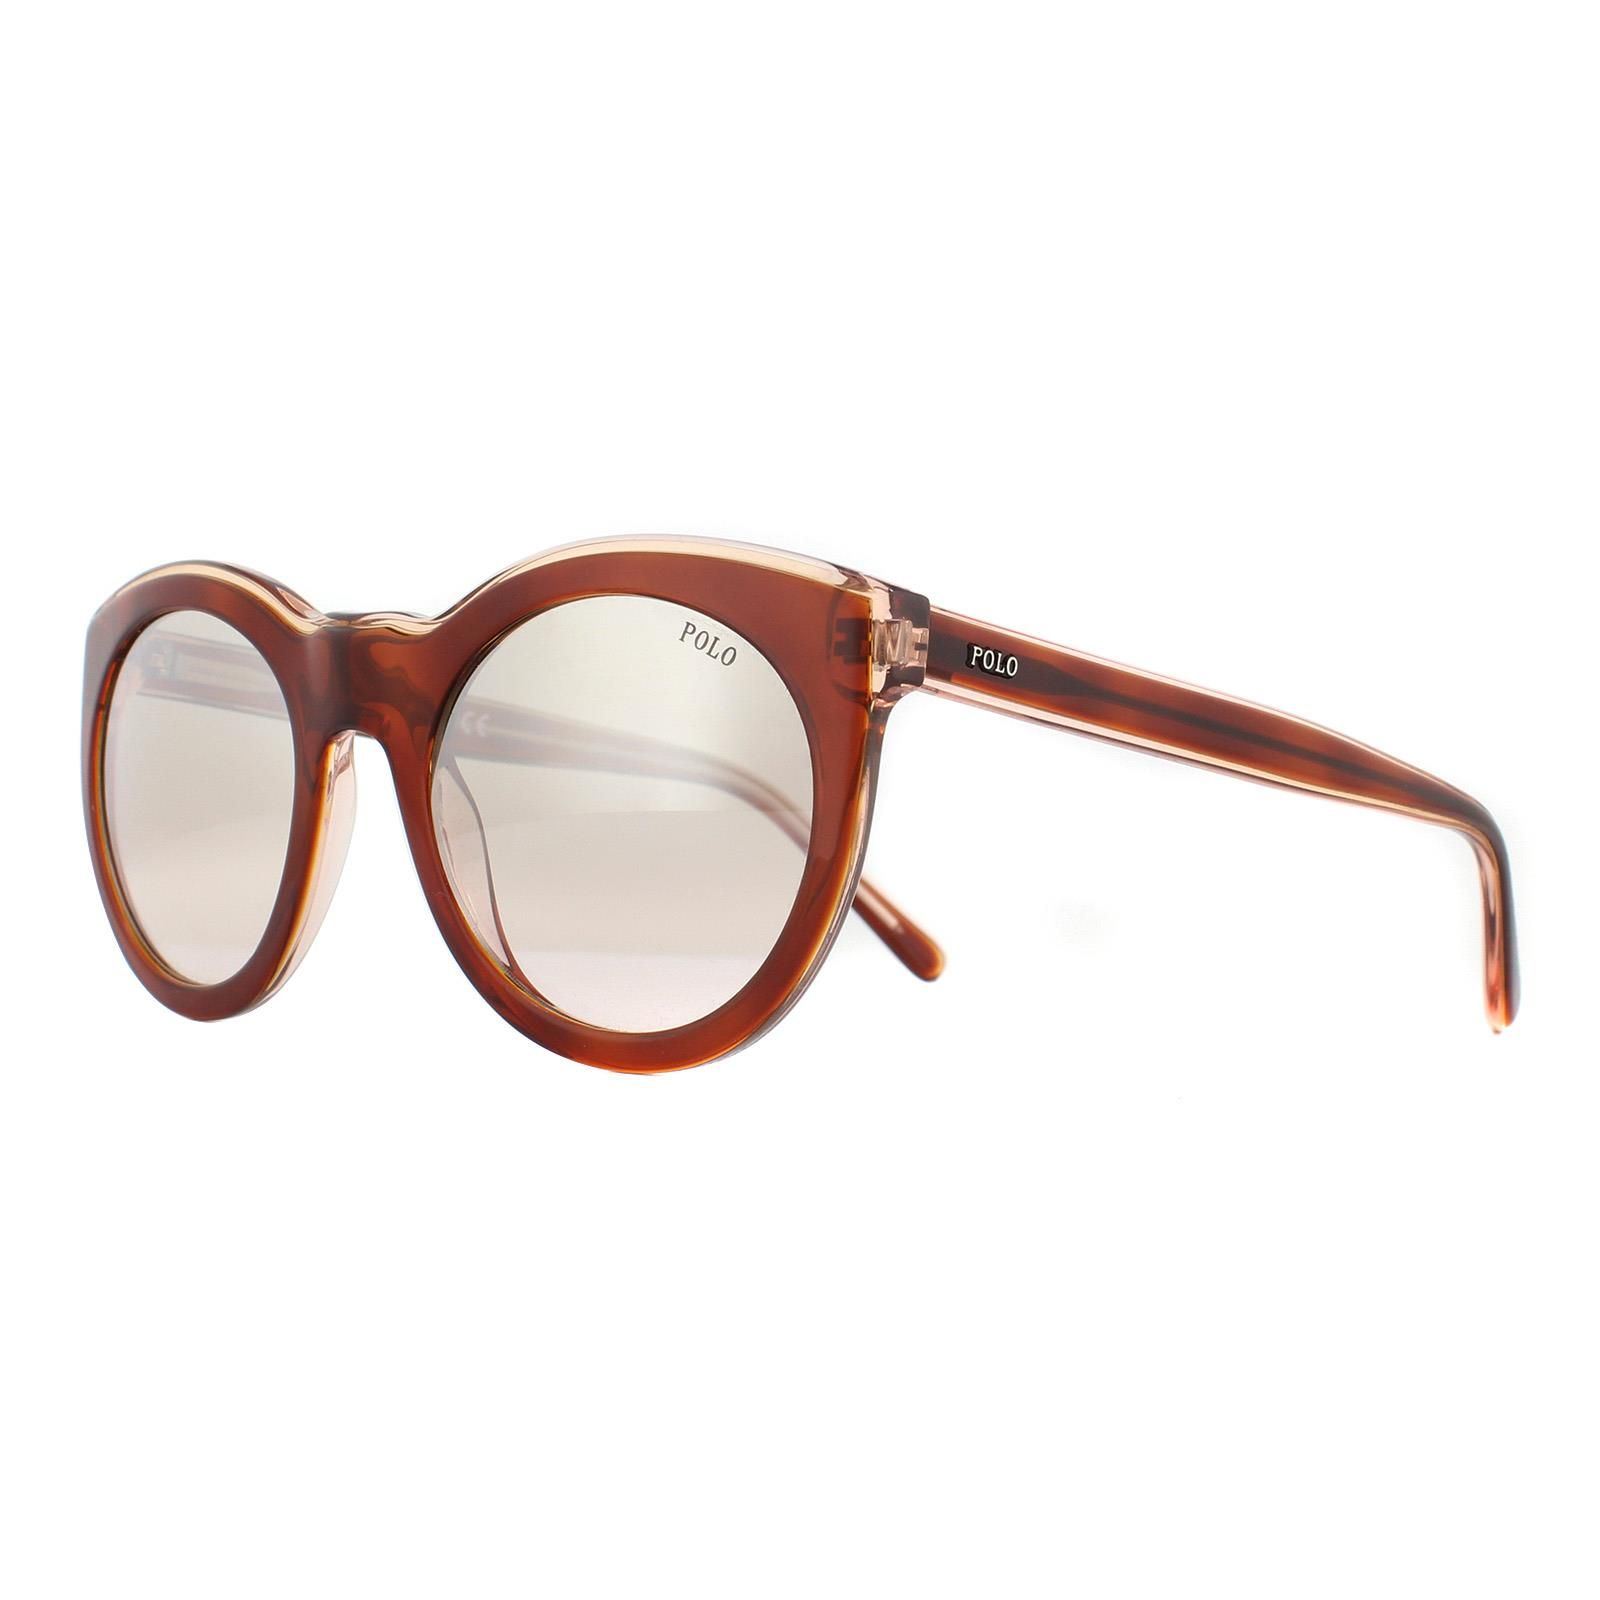 Polo Ralph Lauren Sunglasses 4124 56398Z Havana Honey on Pink Crystal Pink Mirror